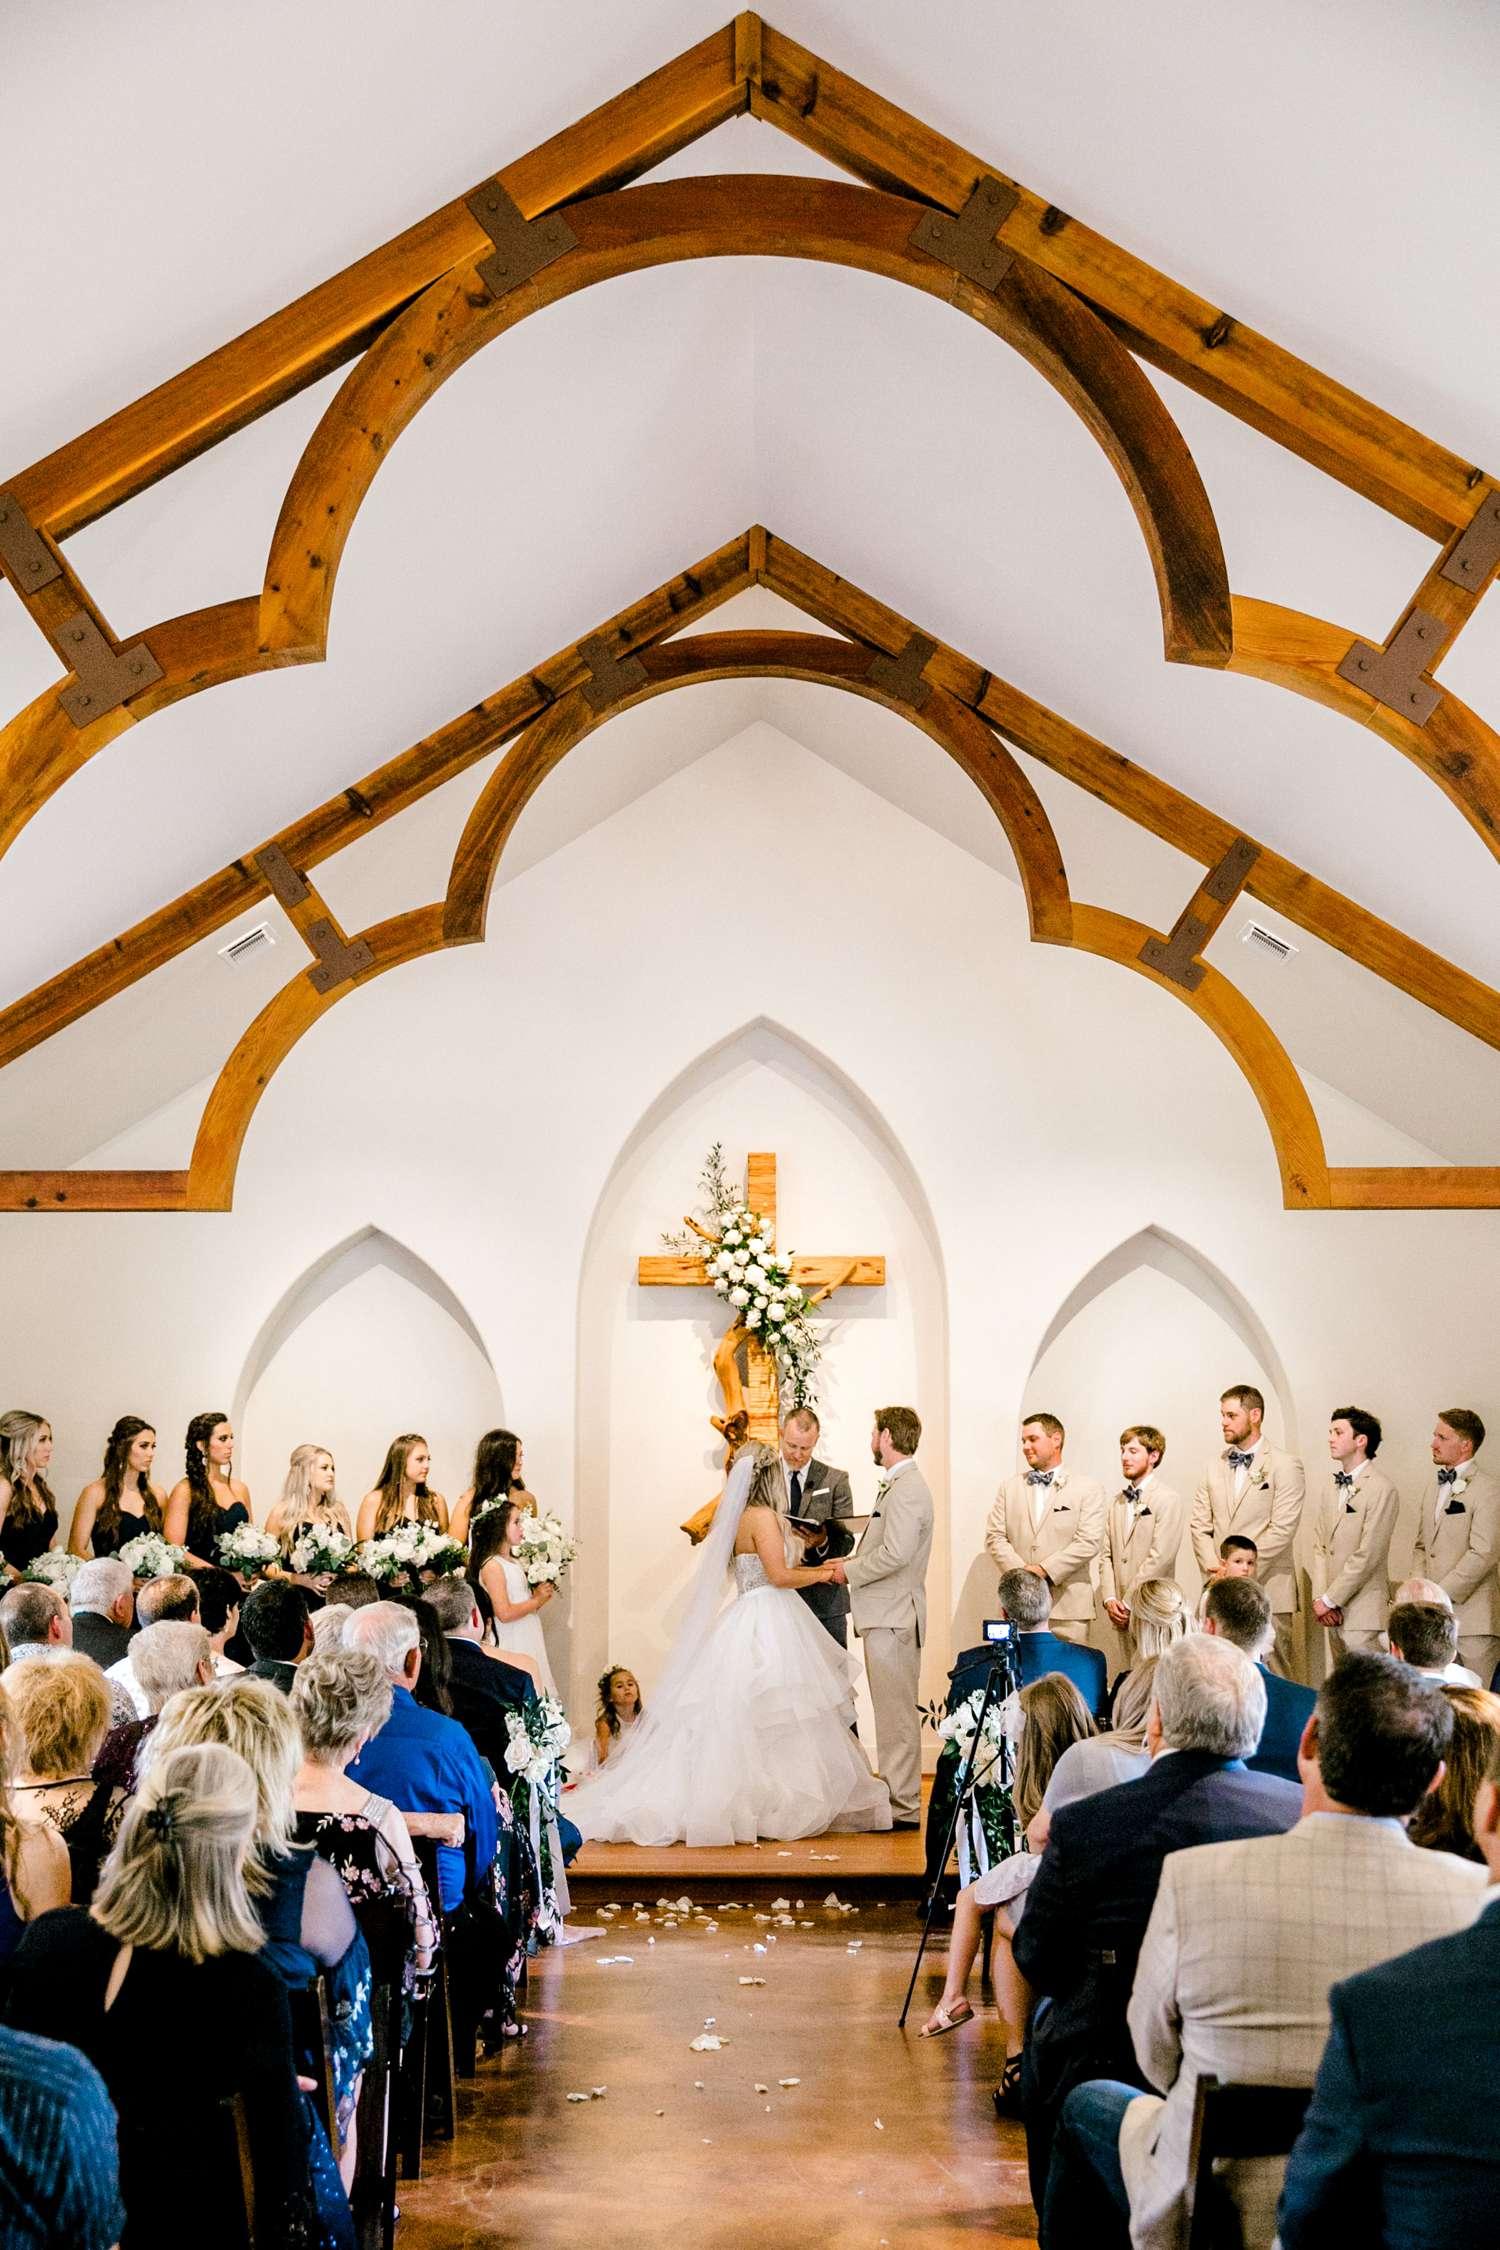 HAYLEE+JUSTIN+GREGORY+HERITAGE_HAUS_AUSTIN_TEXAS_WEDDING_0085.jpg